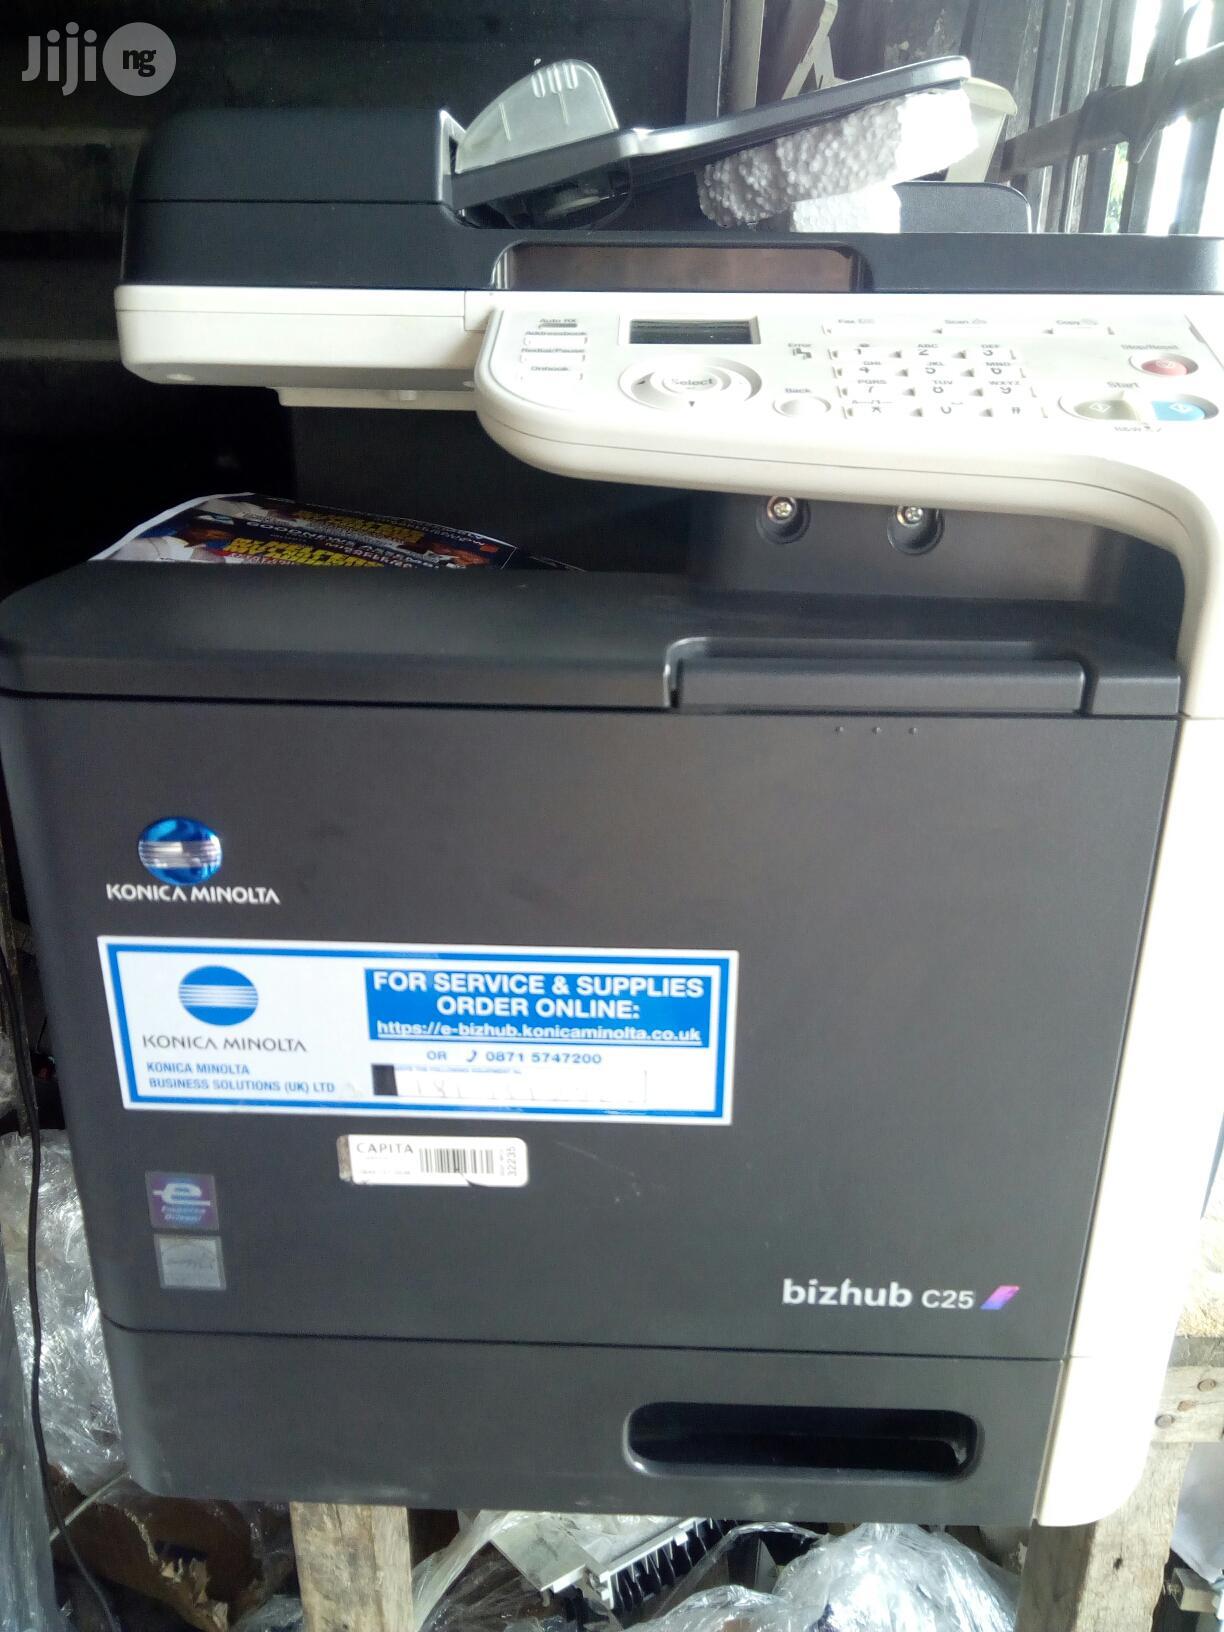 Archive Bizhub C25 Color Di Konica Minolta Printer In Surulere Printers Scanners Osita Jake Okafor Okafor Jiji Ng